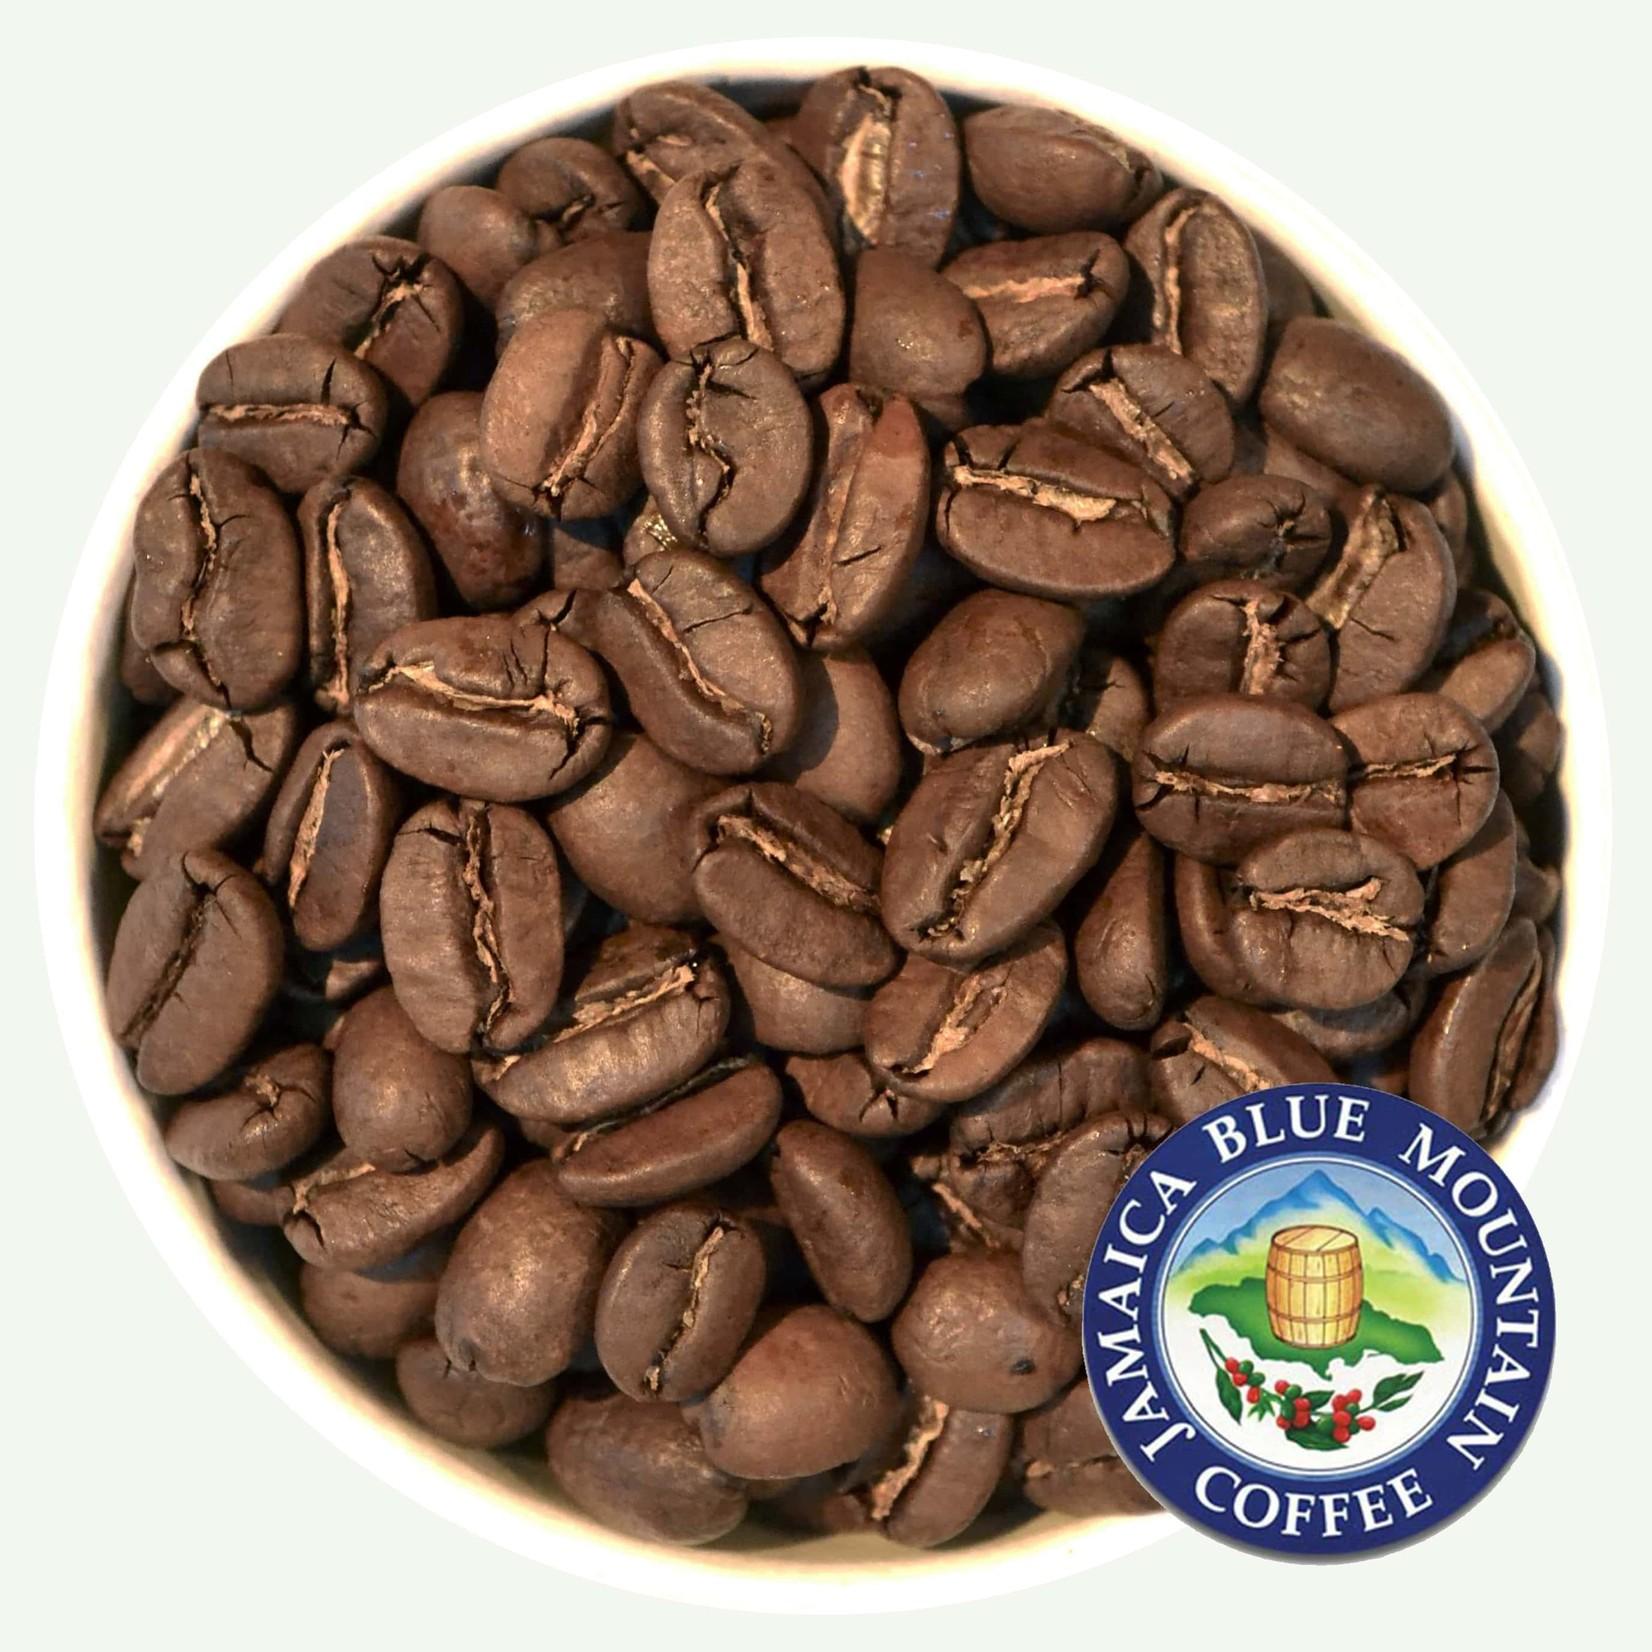 Koffiebranderij Sao Paulo Jamaica Blue Mountain Grade 1 'Sherwood Estate' 125g